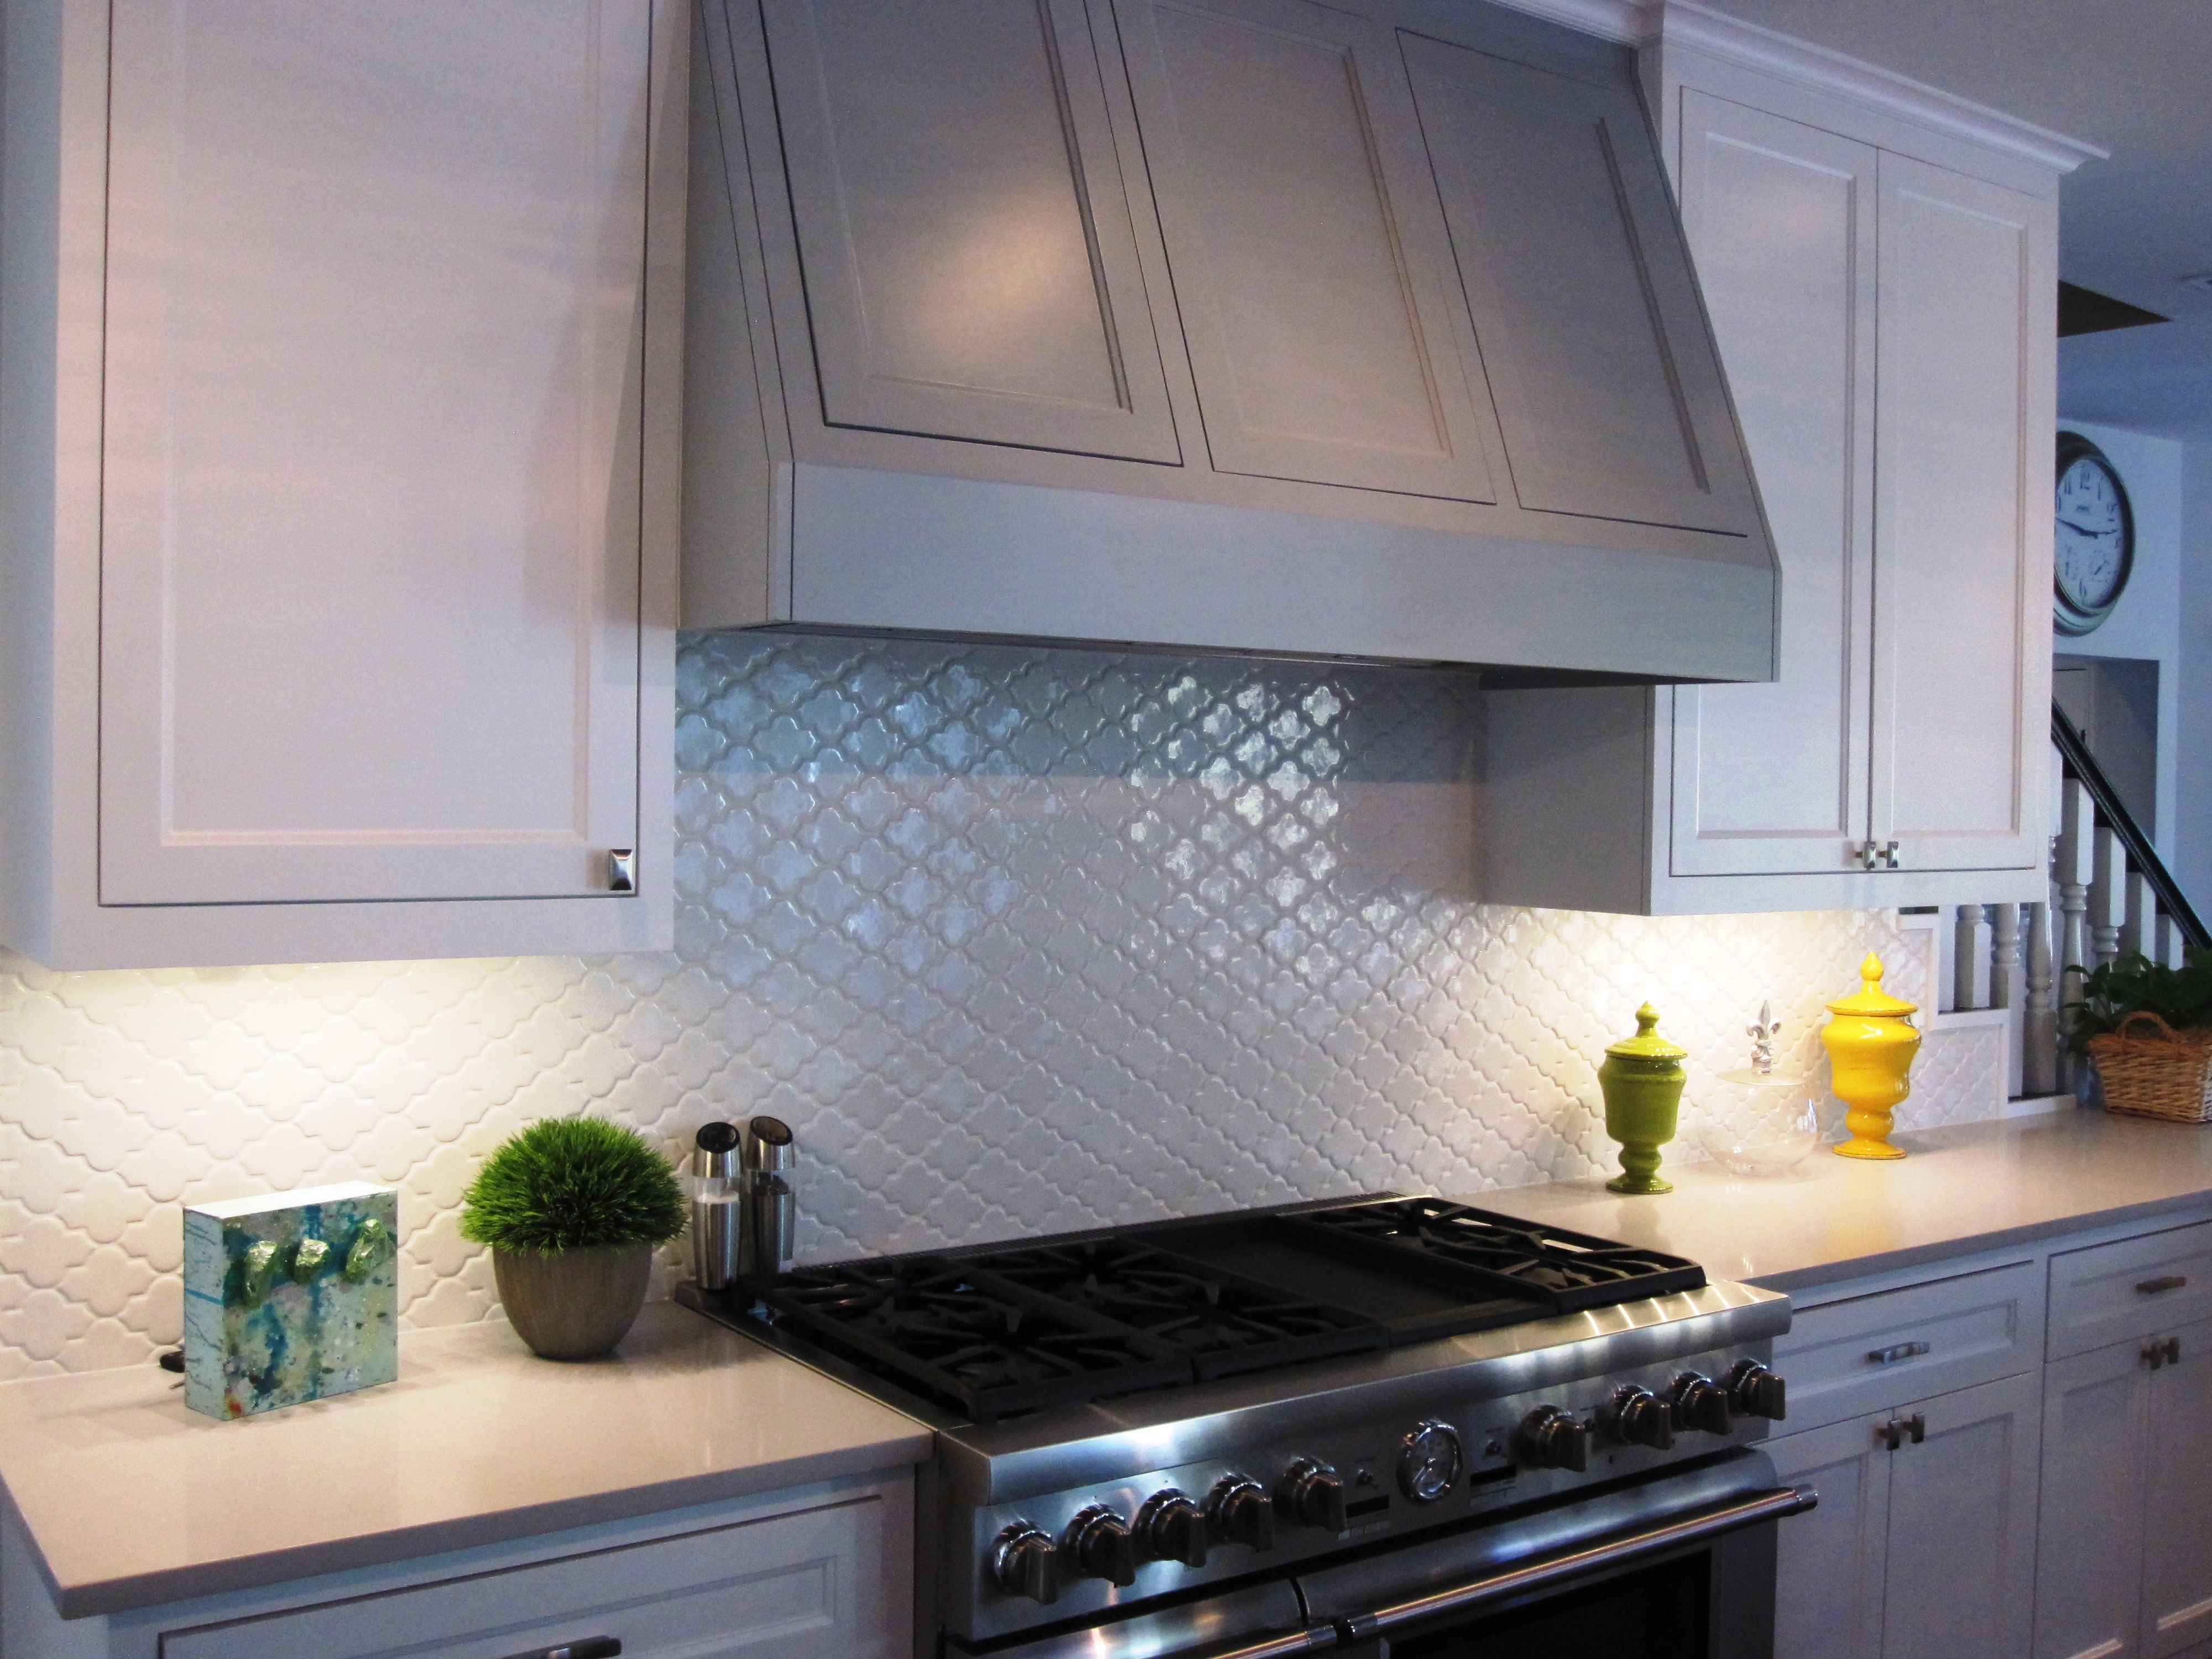 Kitchen Backsplash is a White Moroccan Tile from Walker Zanger ...